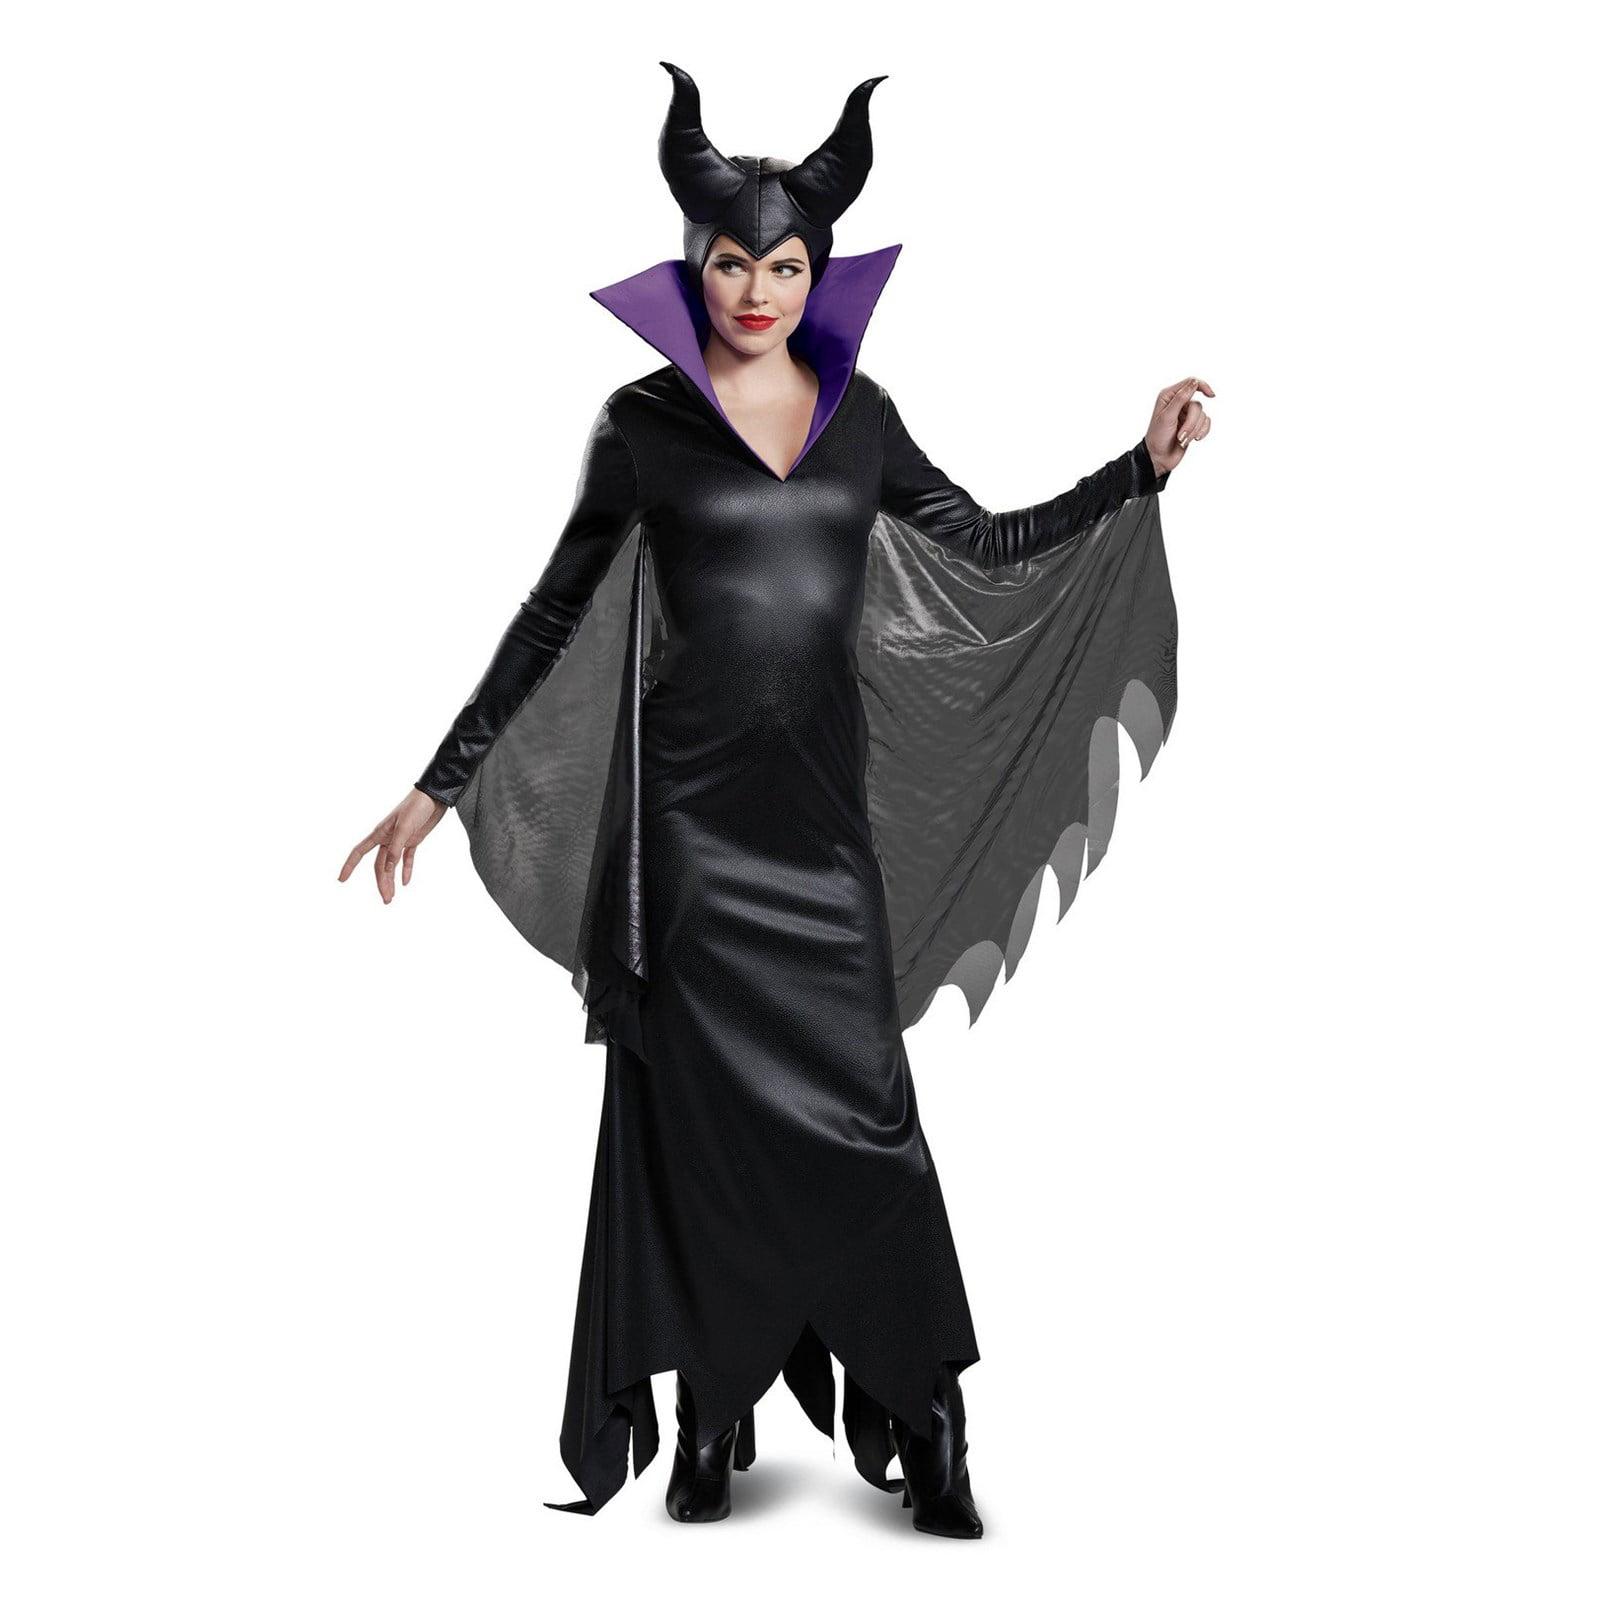 Disney Villains Maleficent Deluxe Adult Halloween Costume